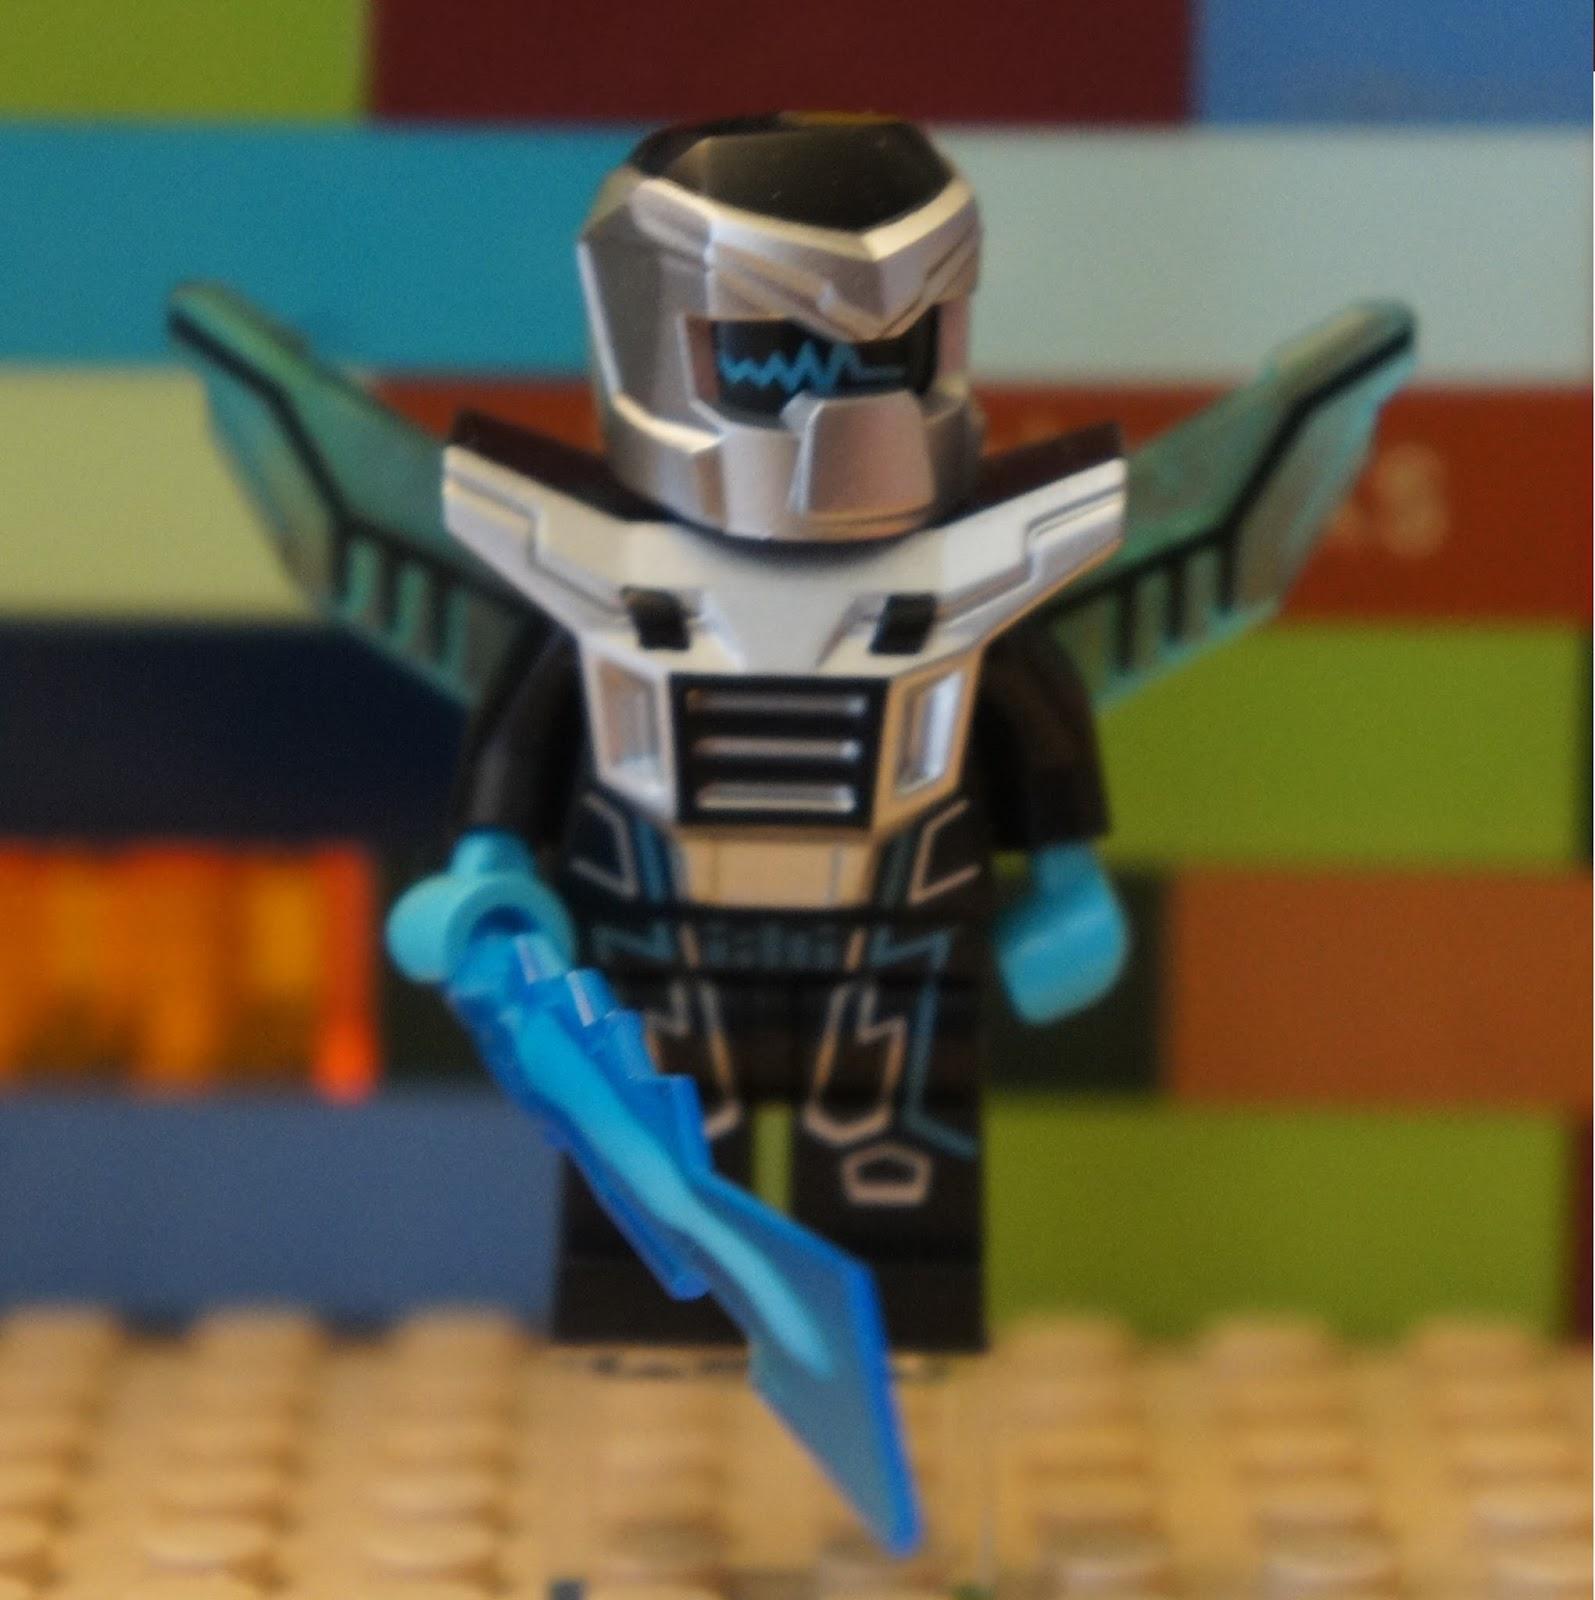 Laser Mech LEGO Series 15 Collectible Minifigure 71011